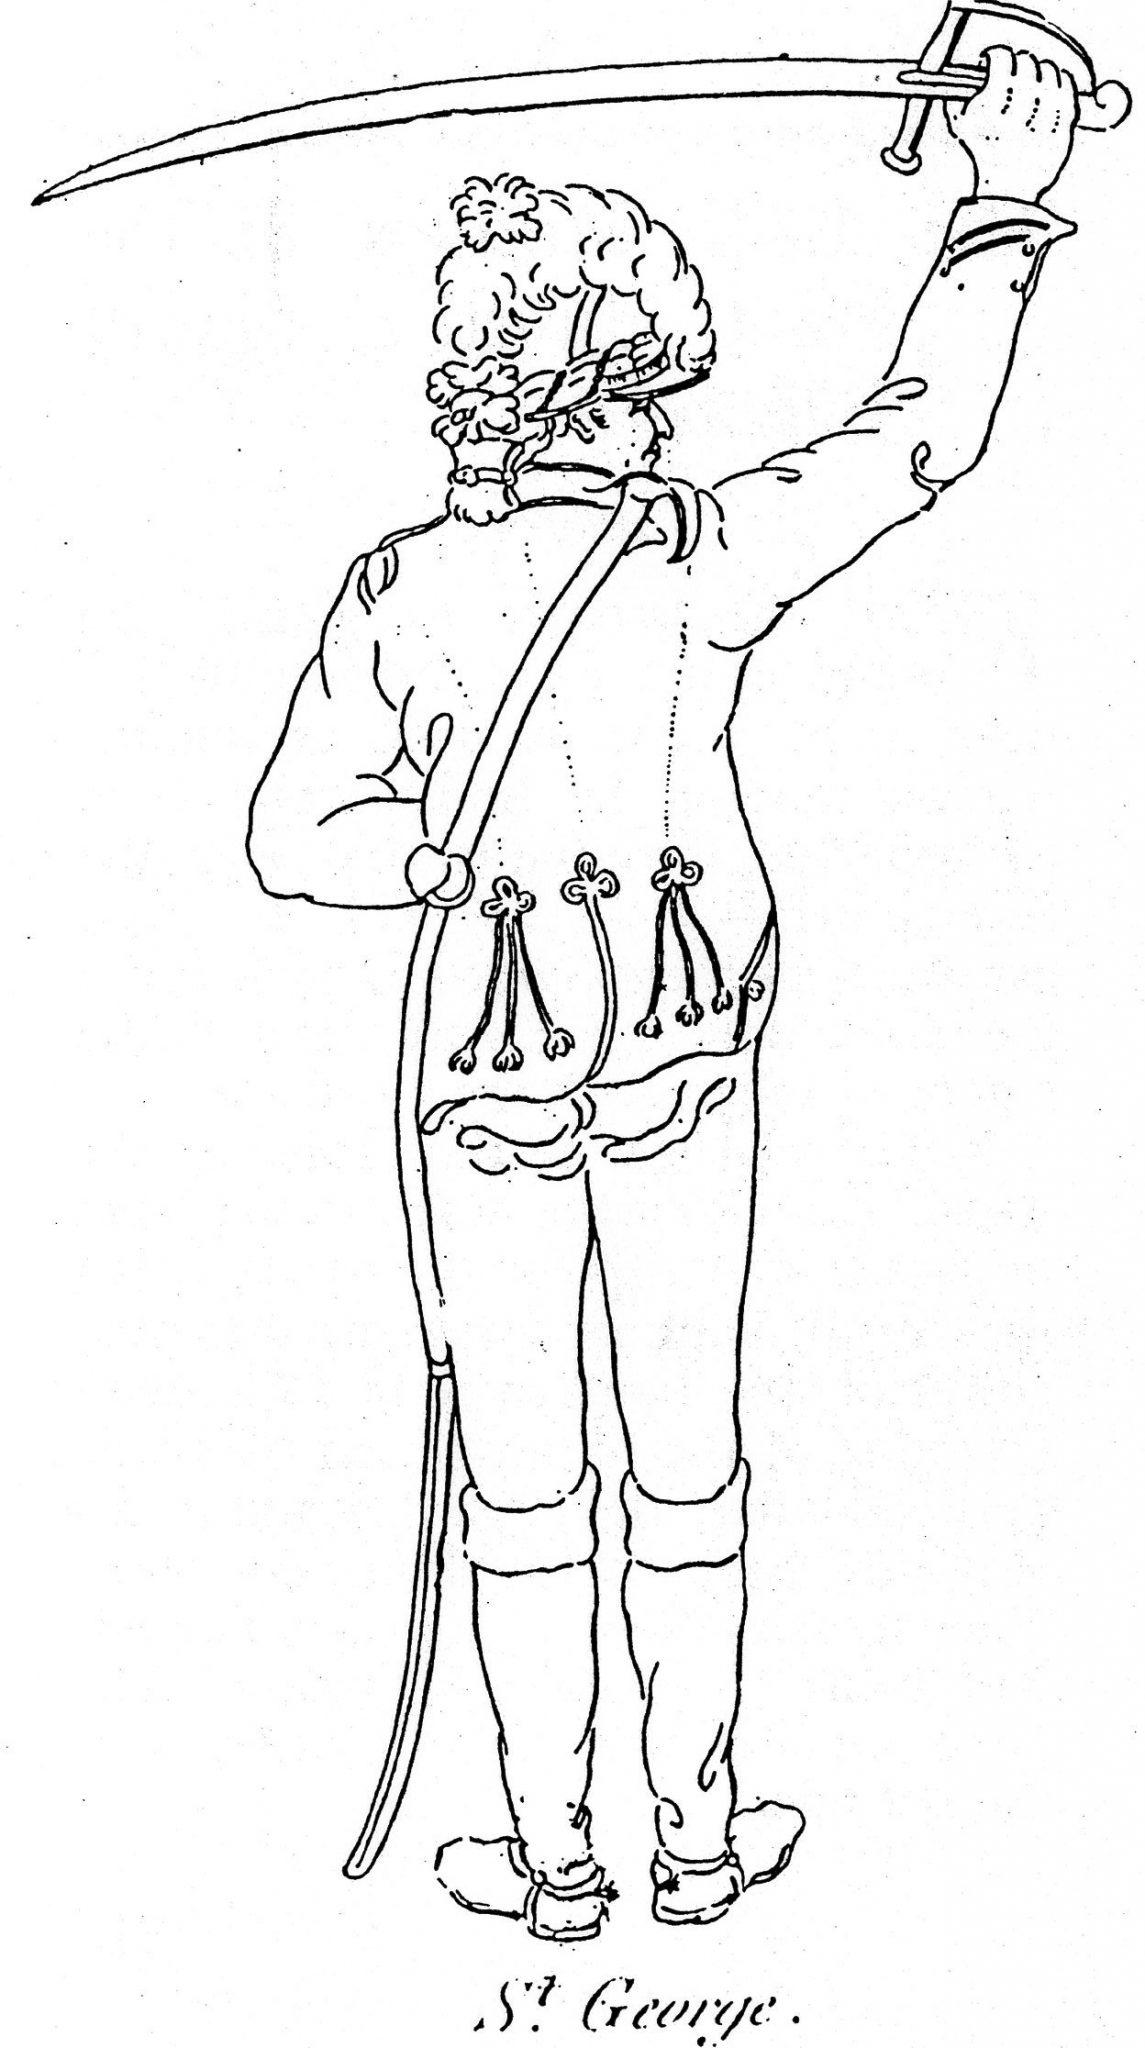 An Abridgement of the New Broad Sword Exercize, London, 1797 2